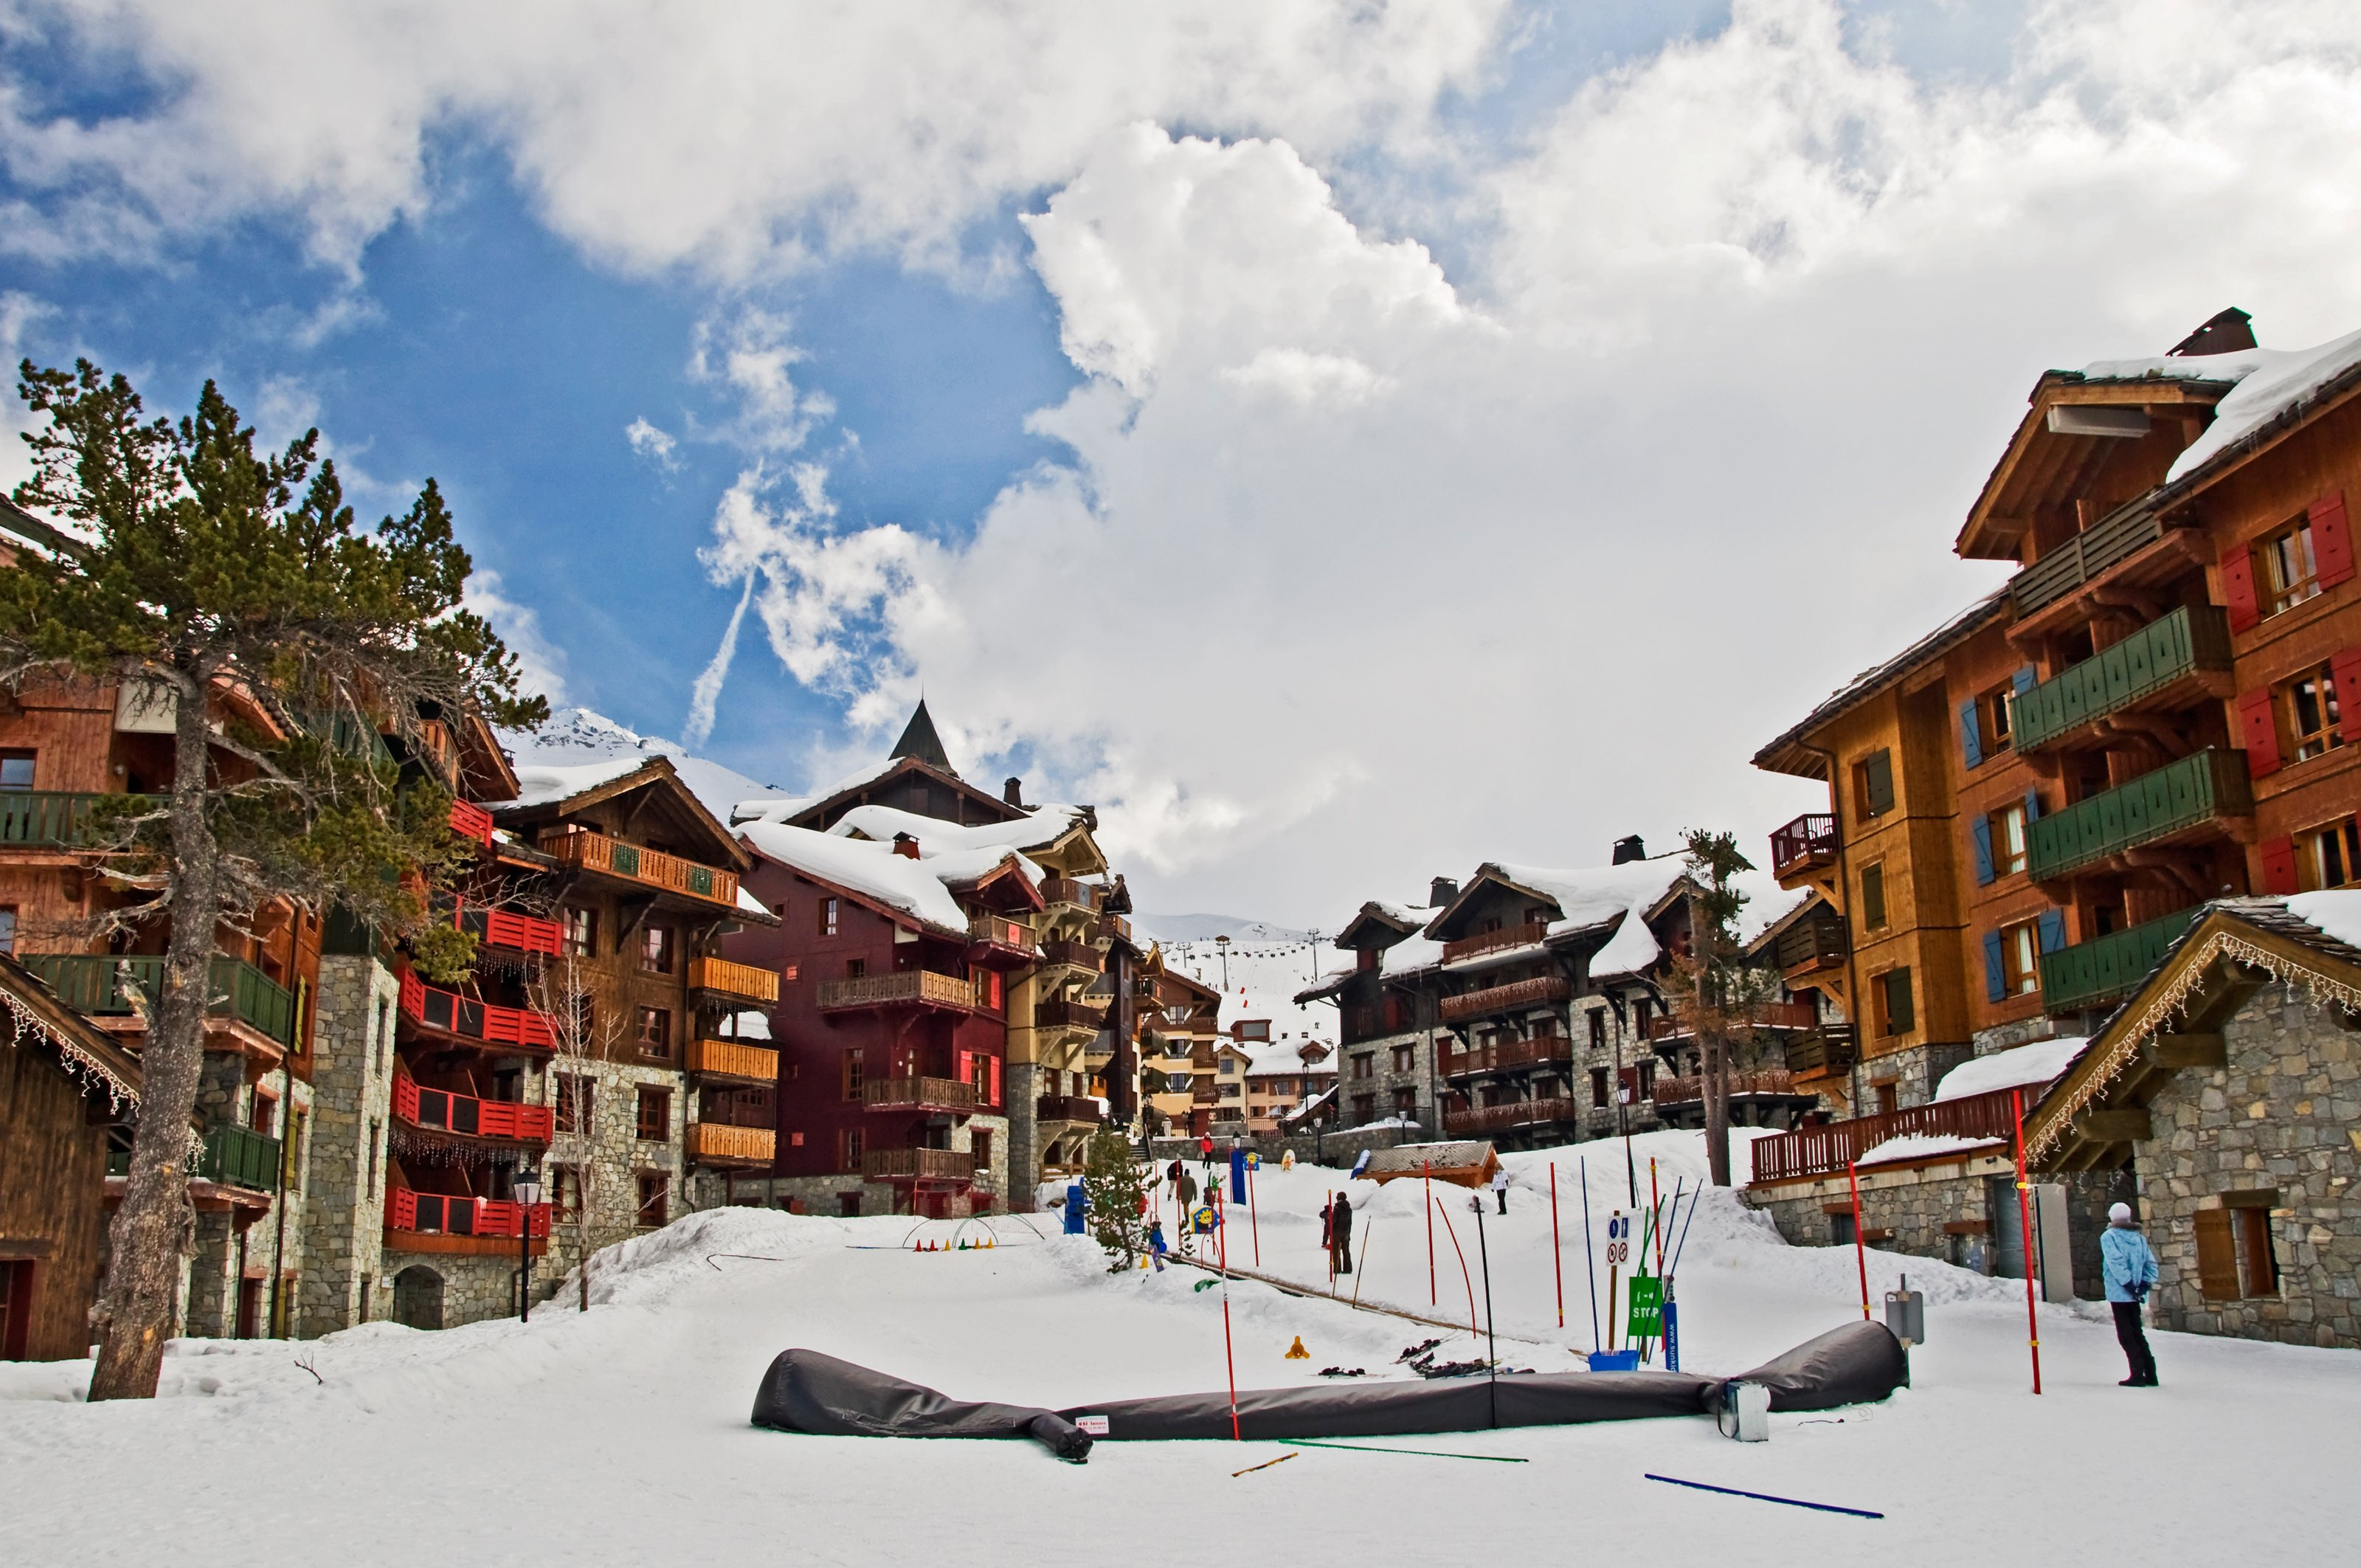 comment-choisir-station-ski